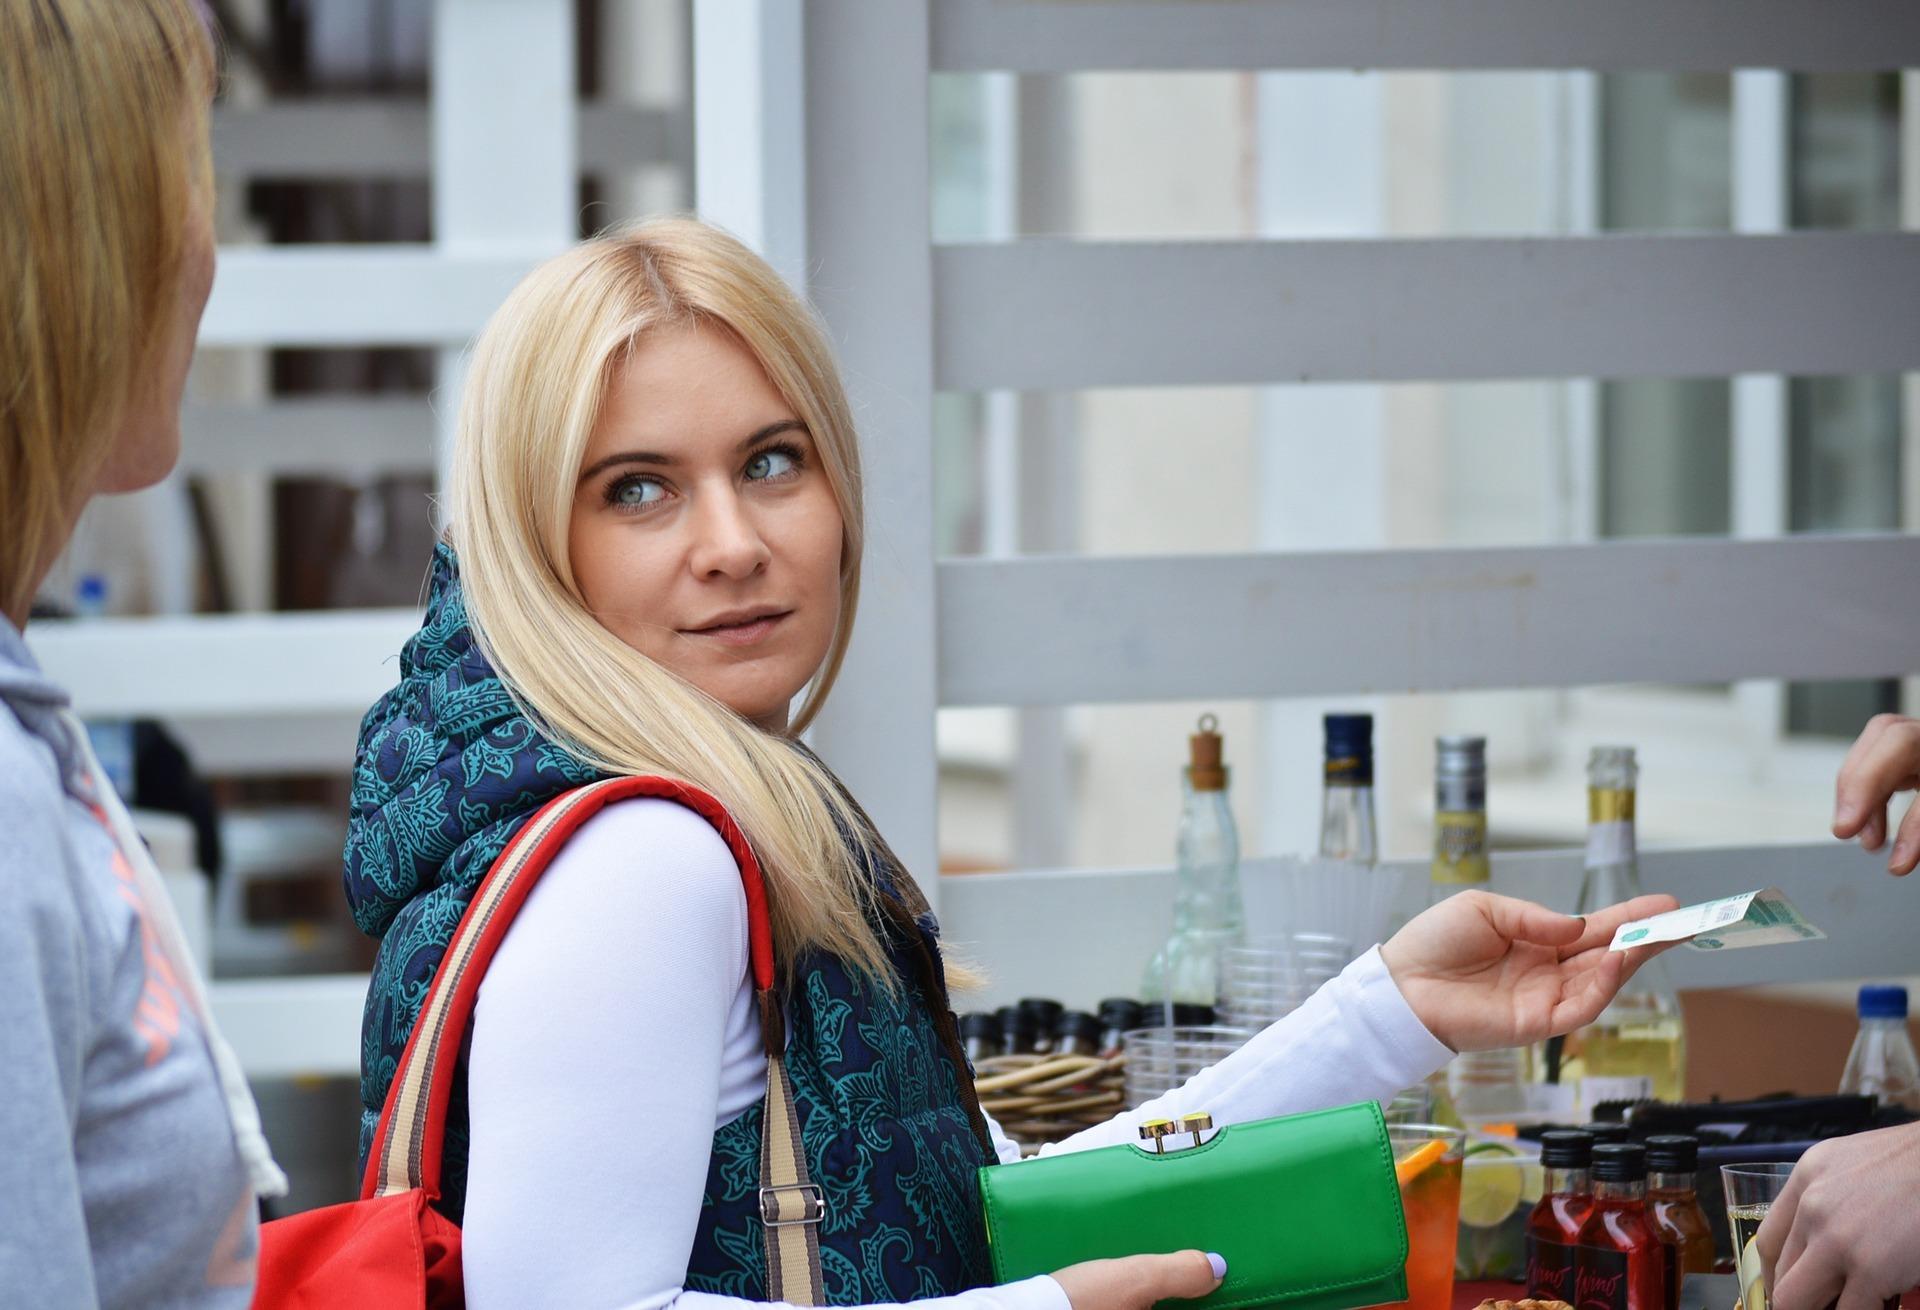 Russische vrouwen daten